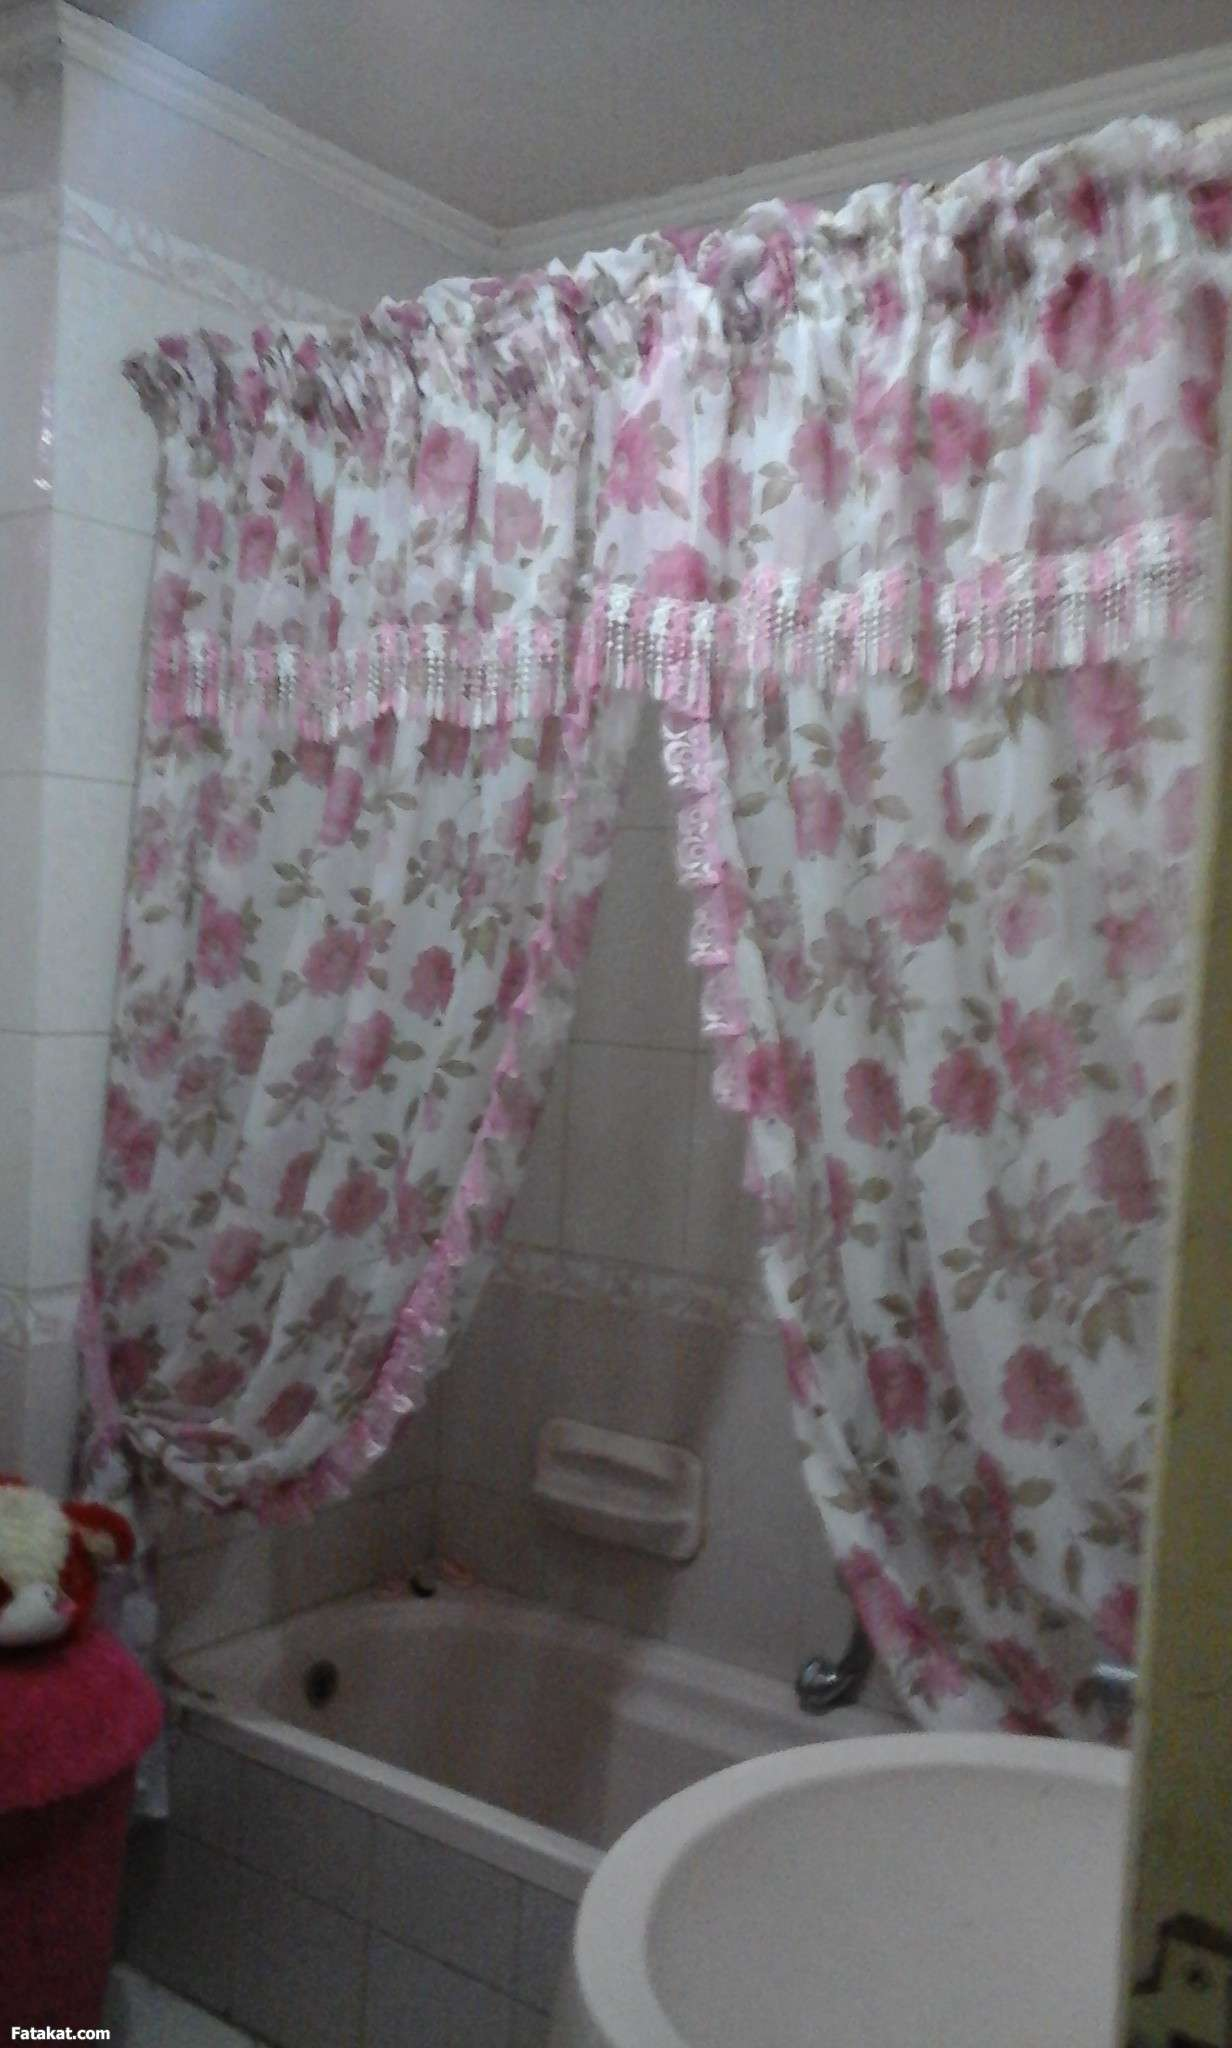 بالصور ستائر حمامات , ستائر بالوان زاهية 1567 4